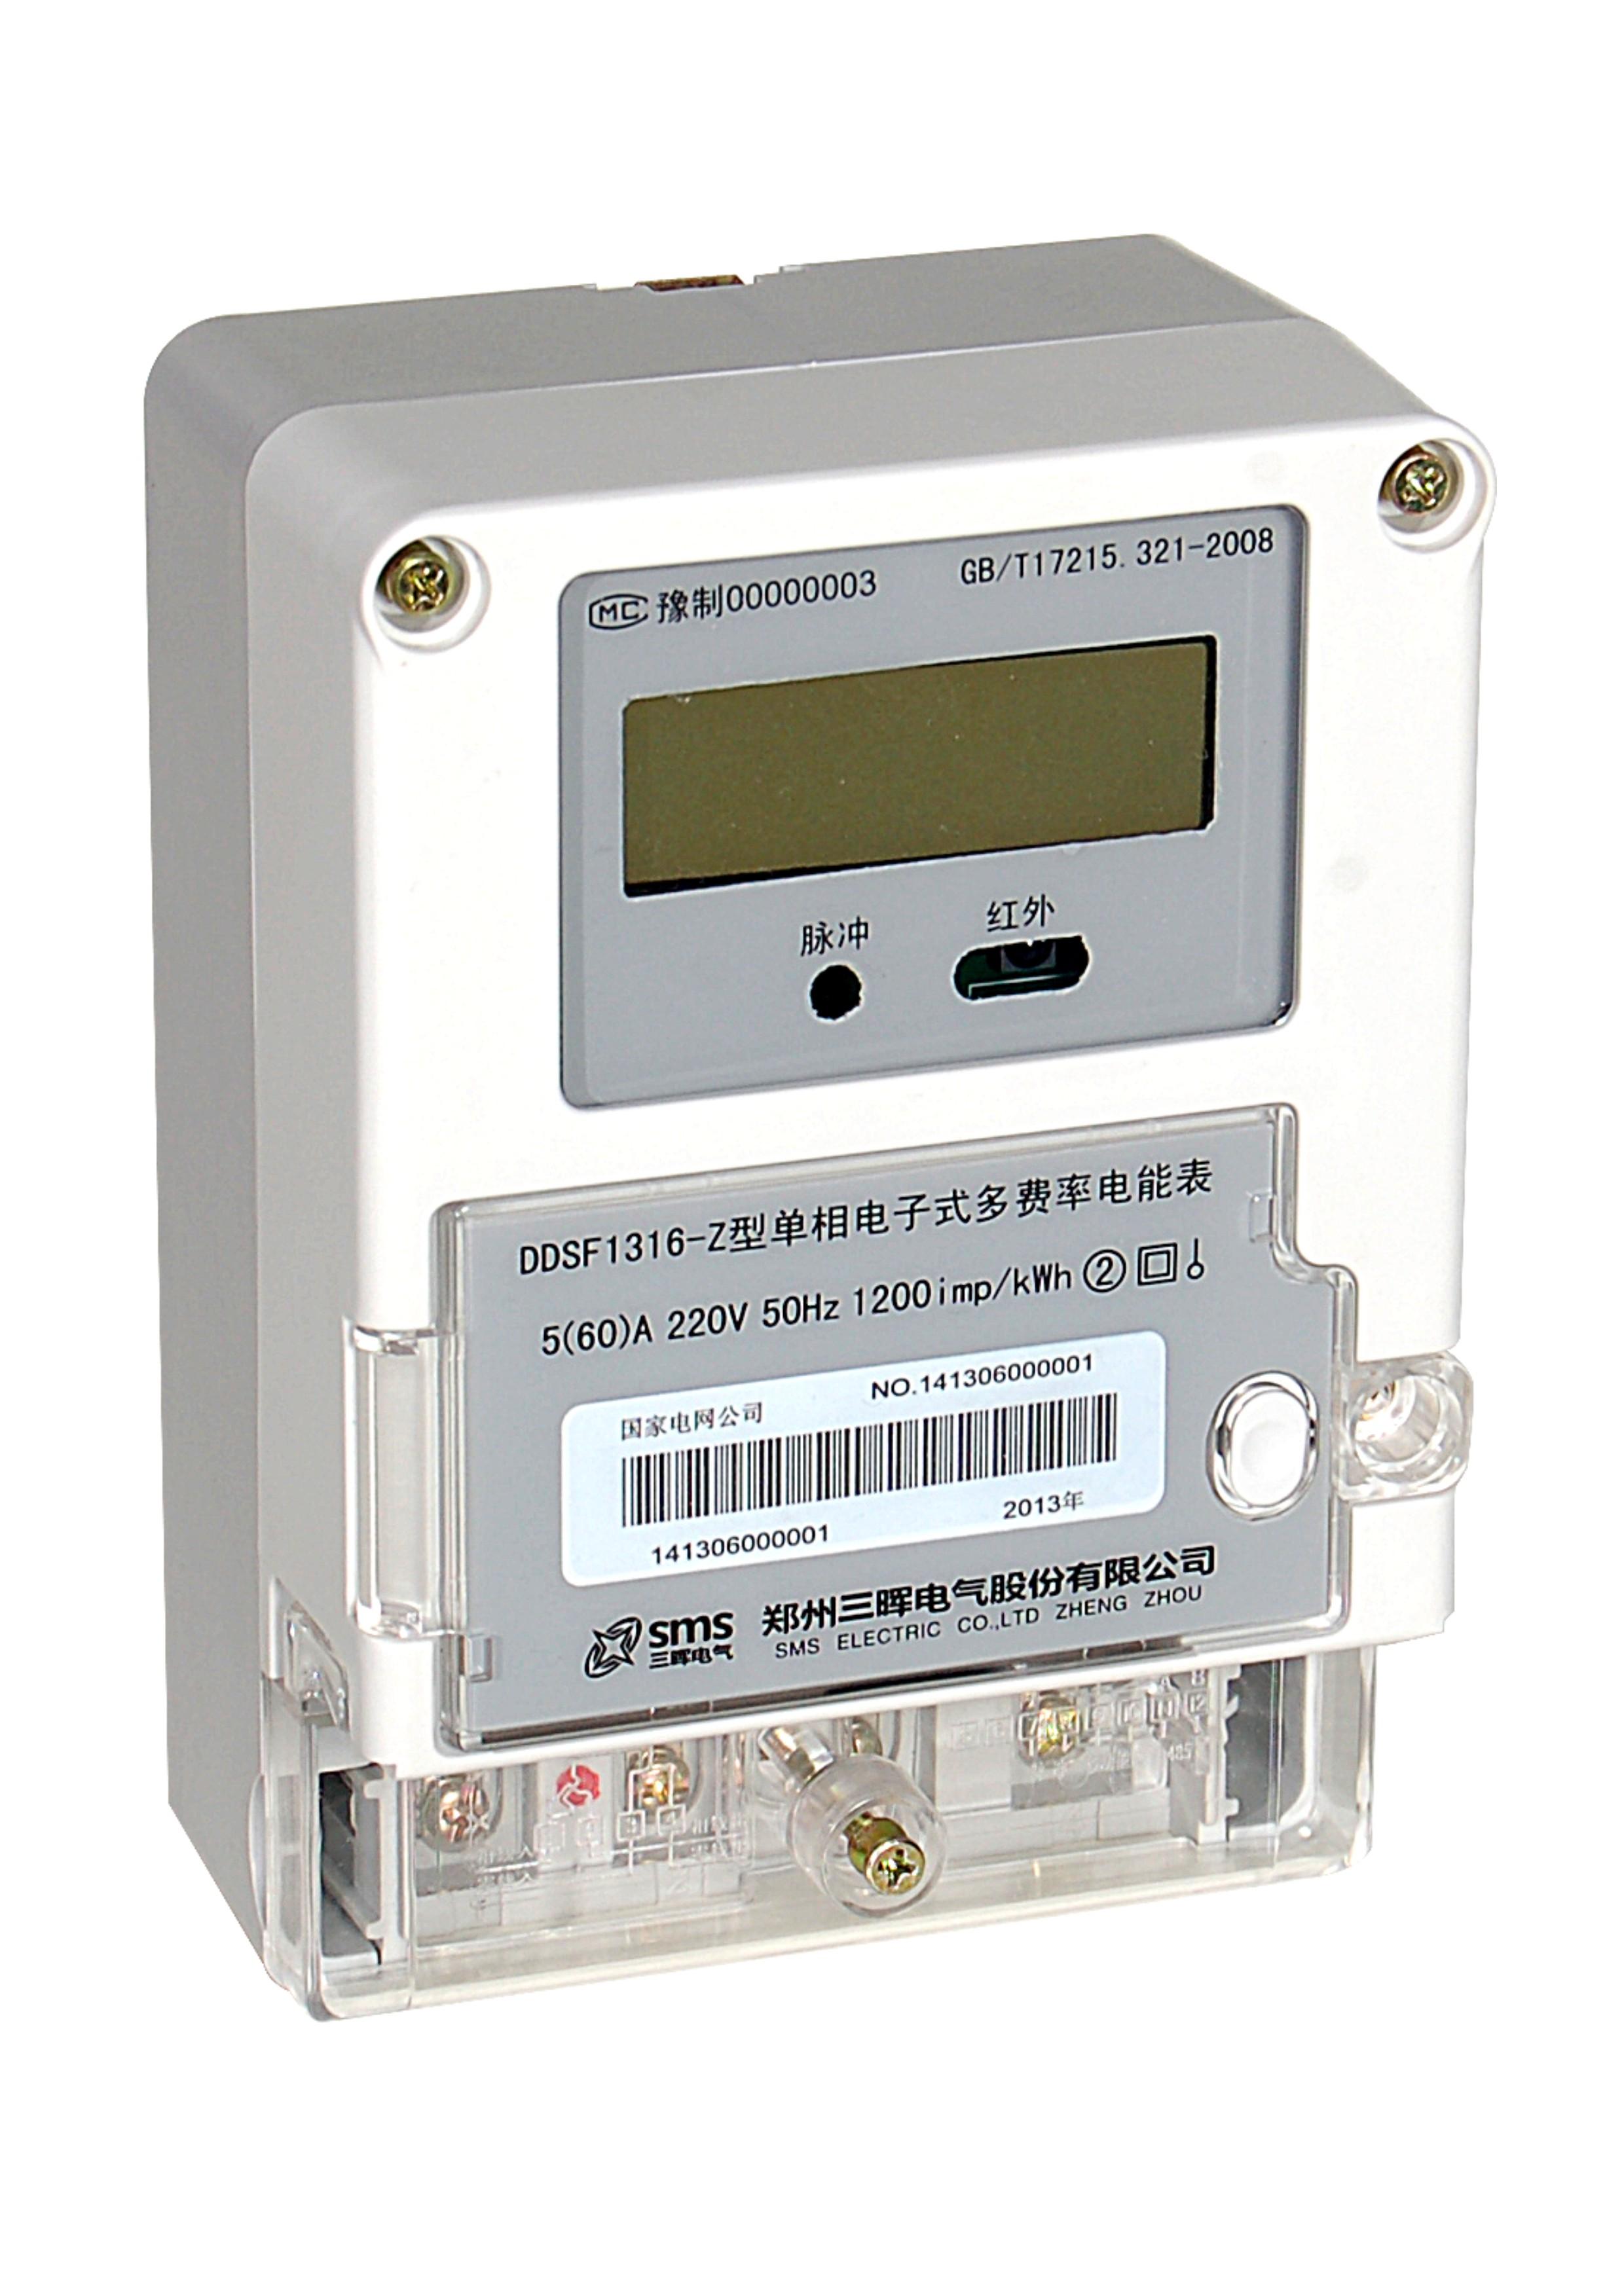 ddsi型电表报价 厂家